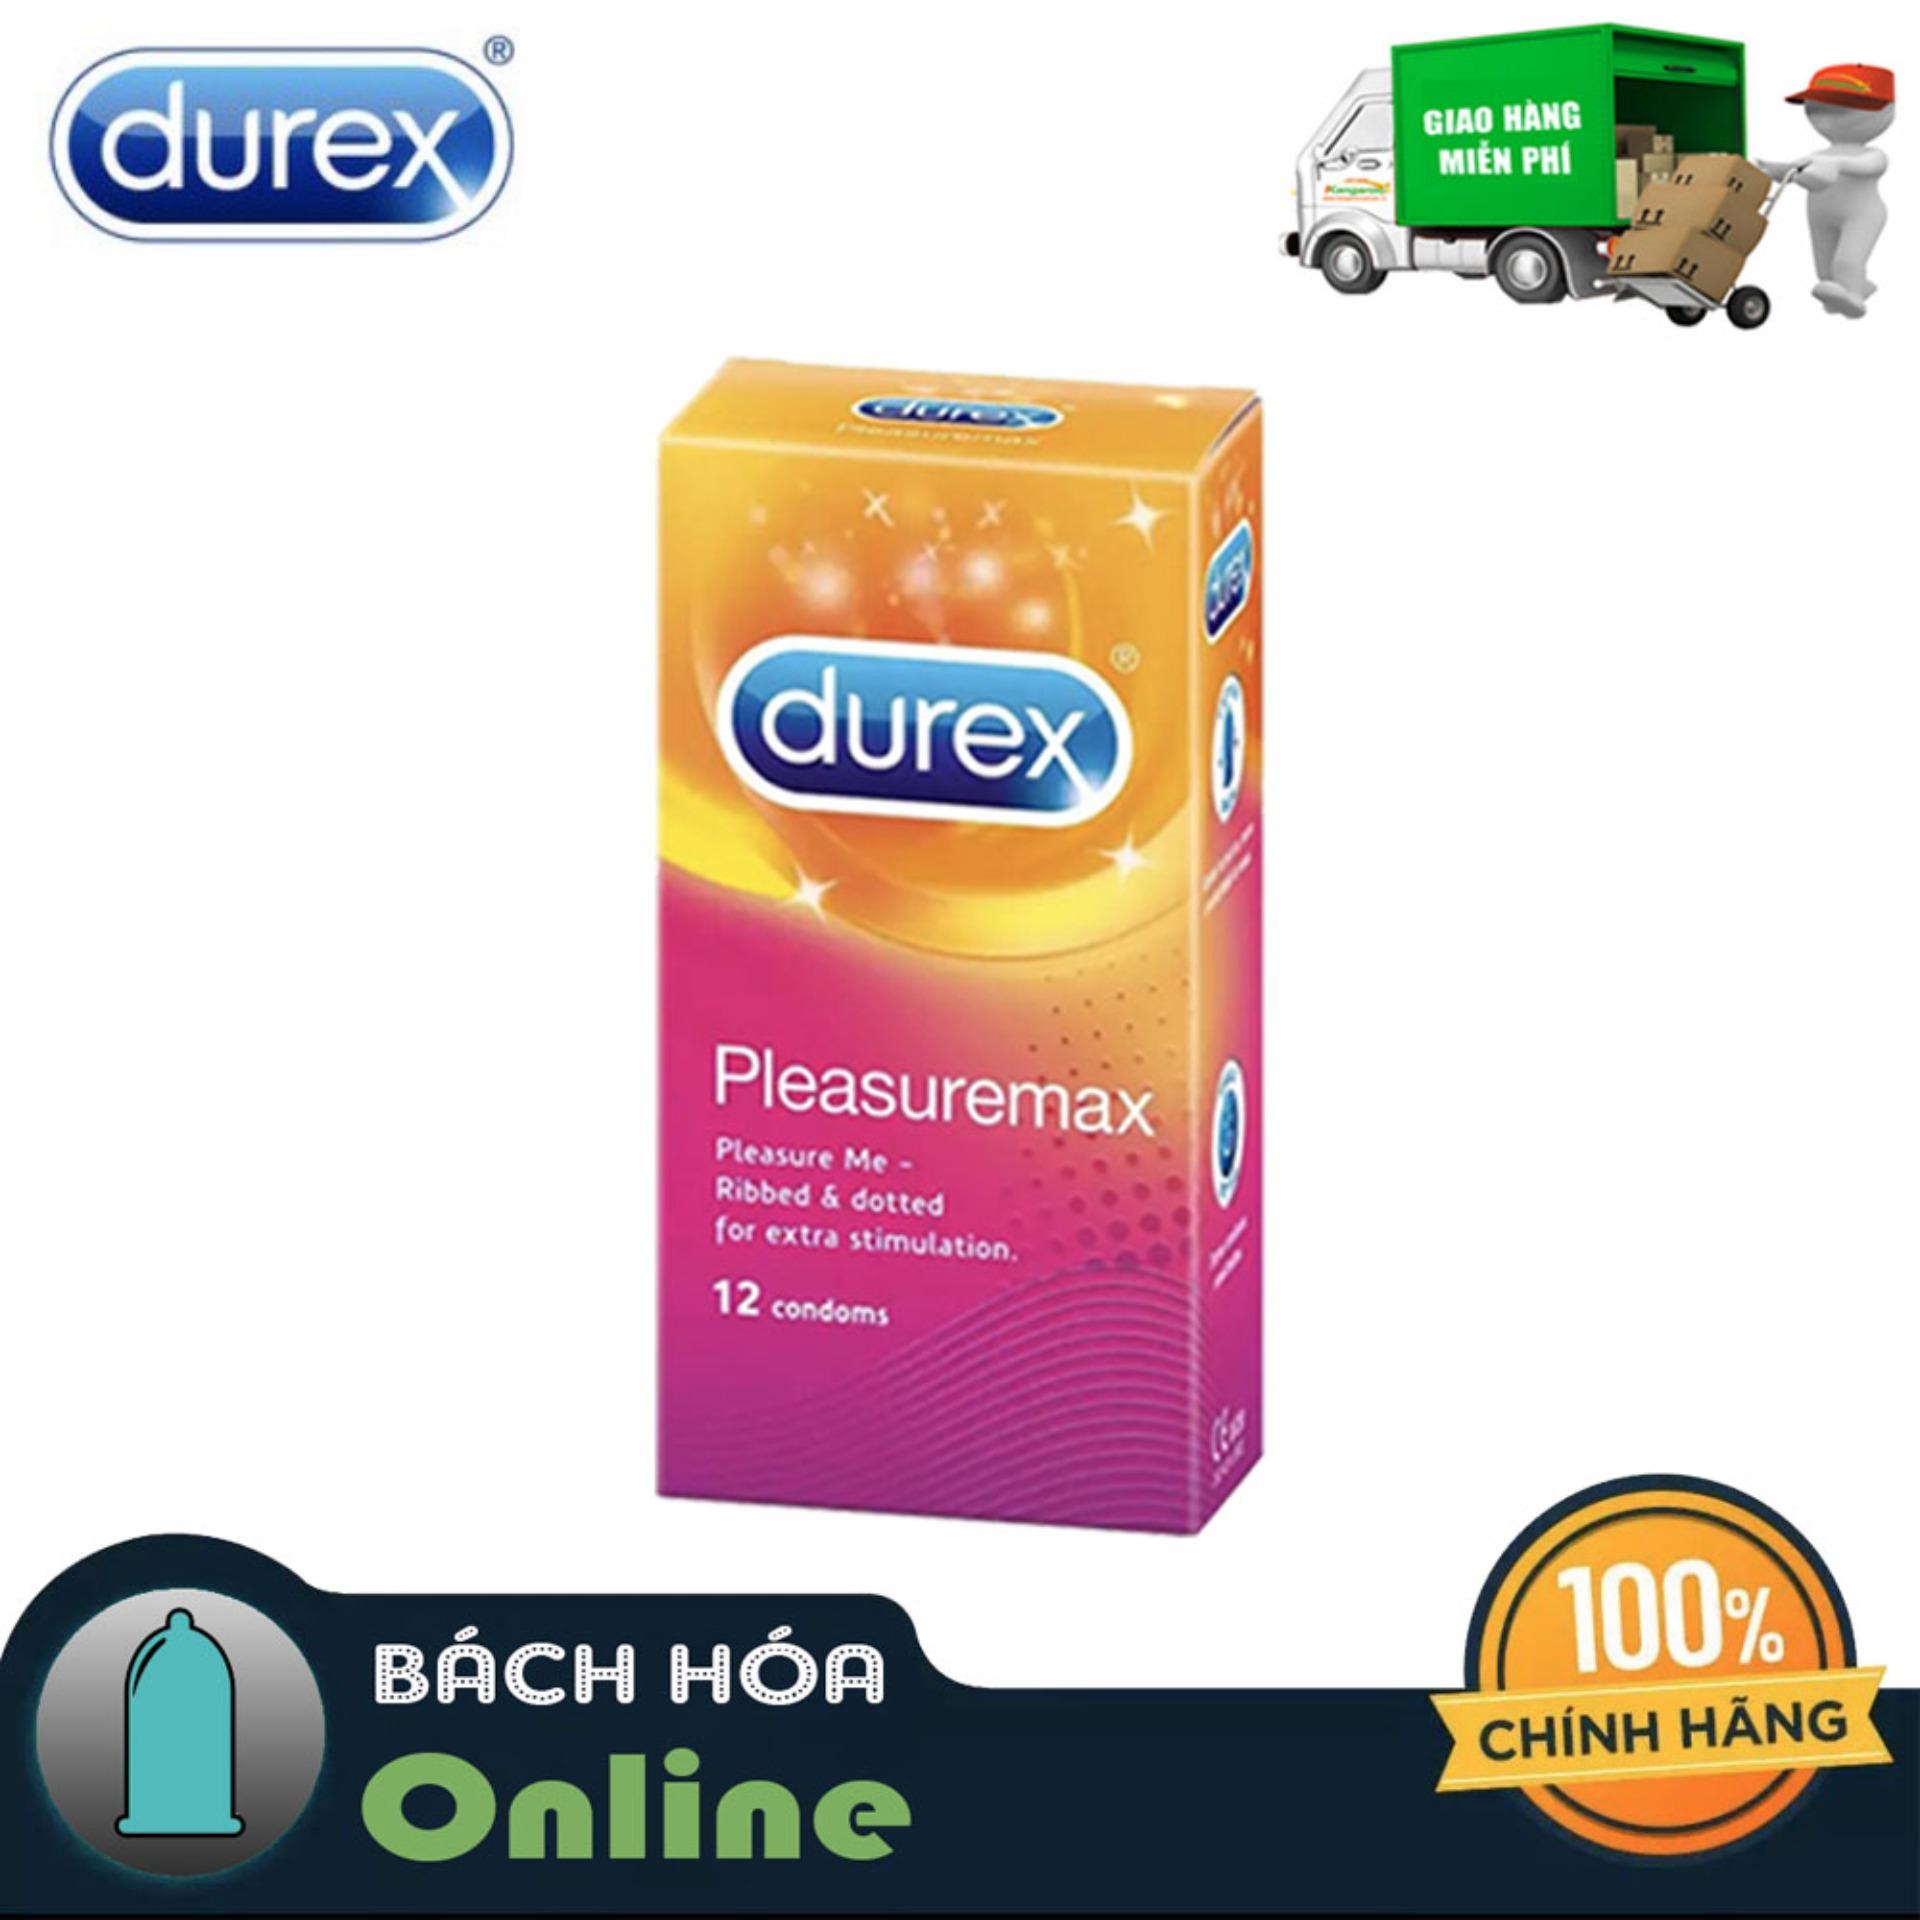 ❤️Bao cao su❤️ BCS Durex Pleasuremax gân gai 12s [che tên sản phẩm] cao cấp